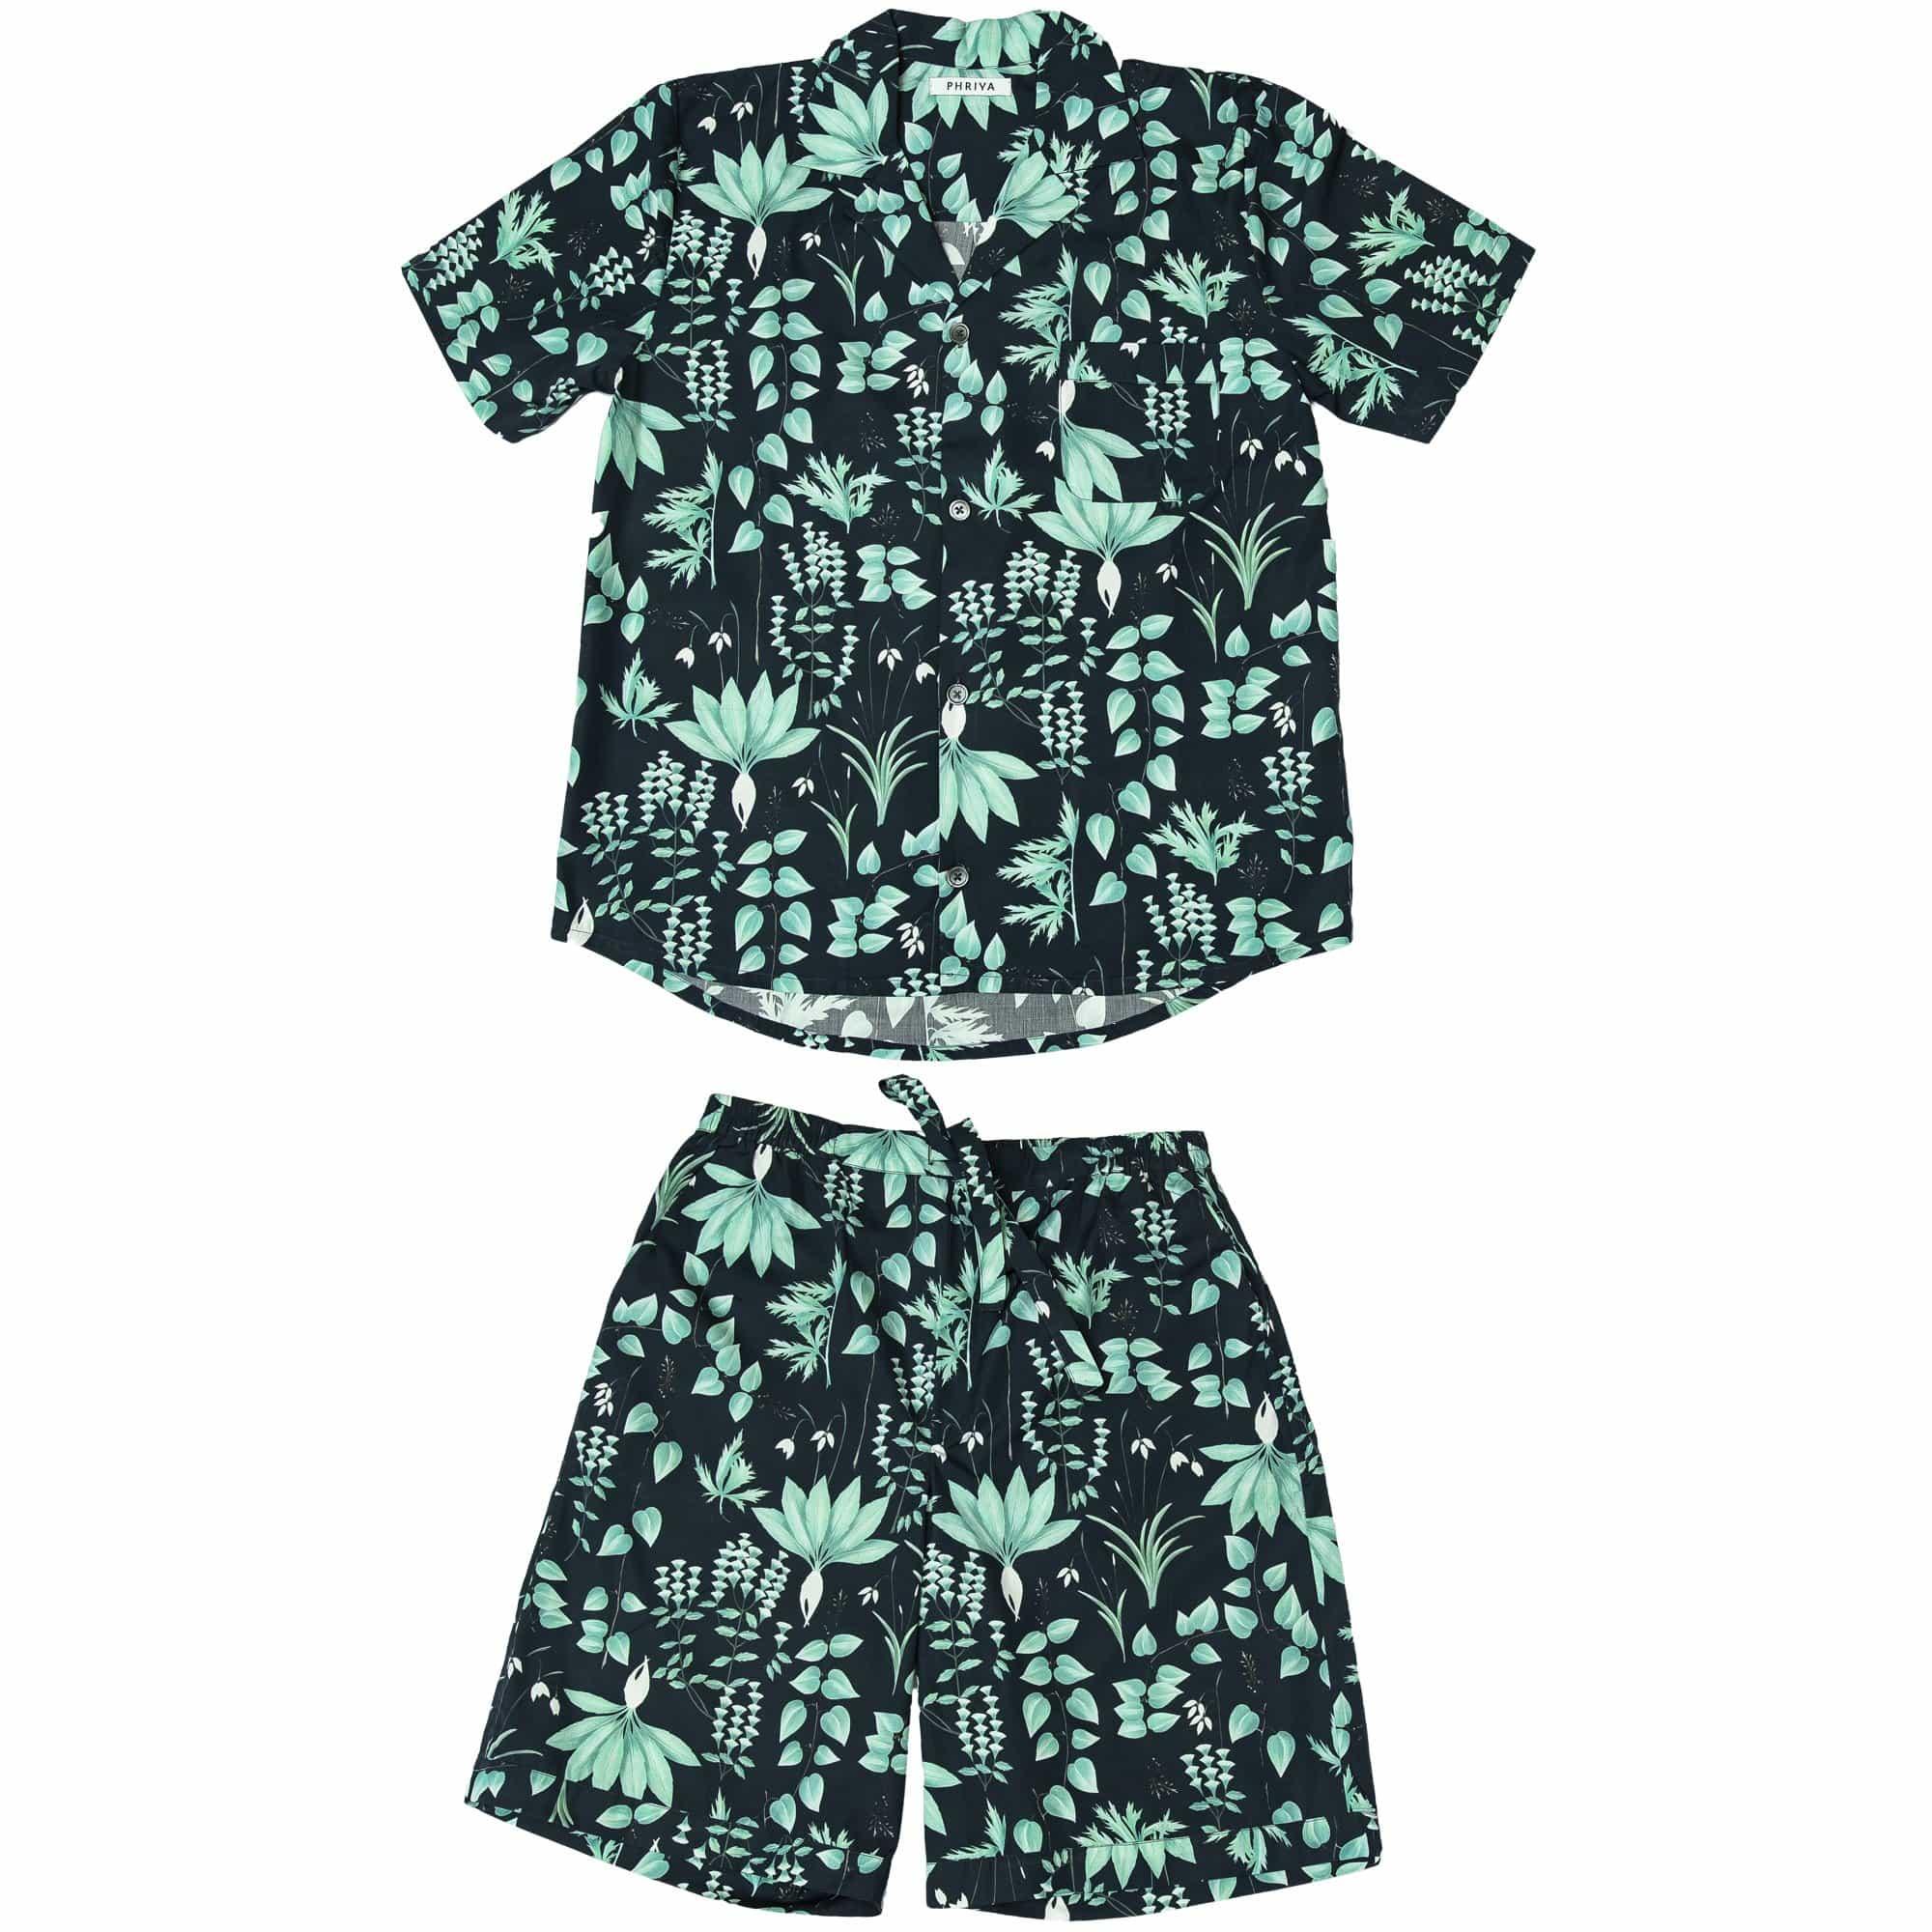 Phriya Men's Navy Blue Circe's Garden Short Pajama Set  - multicolor - Size: One Size